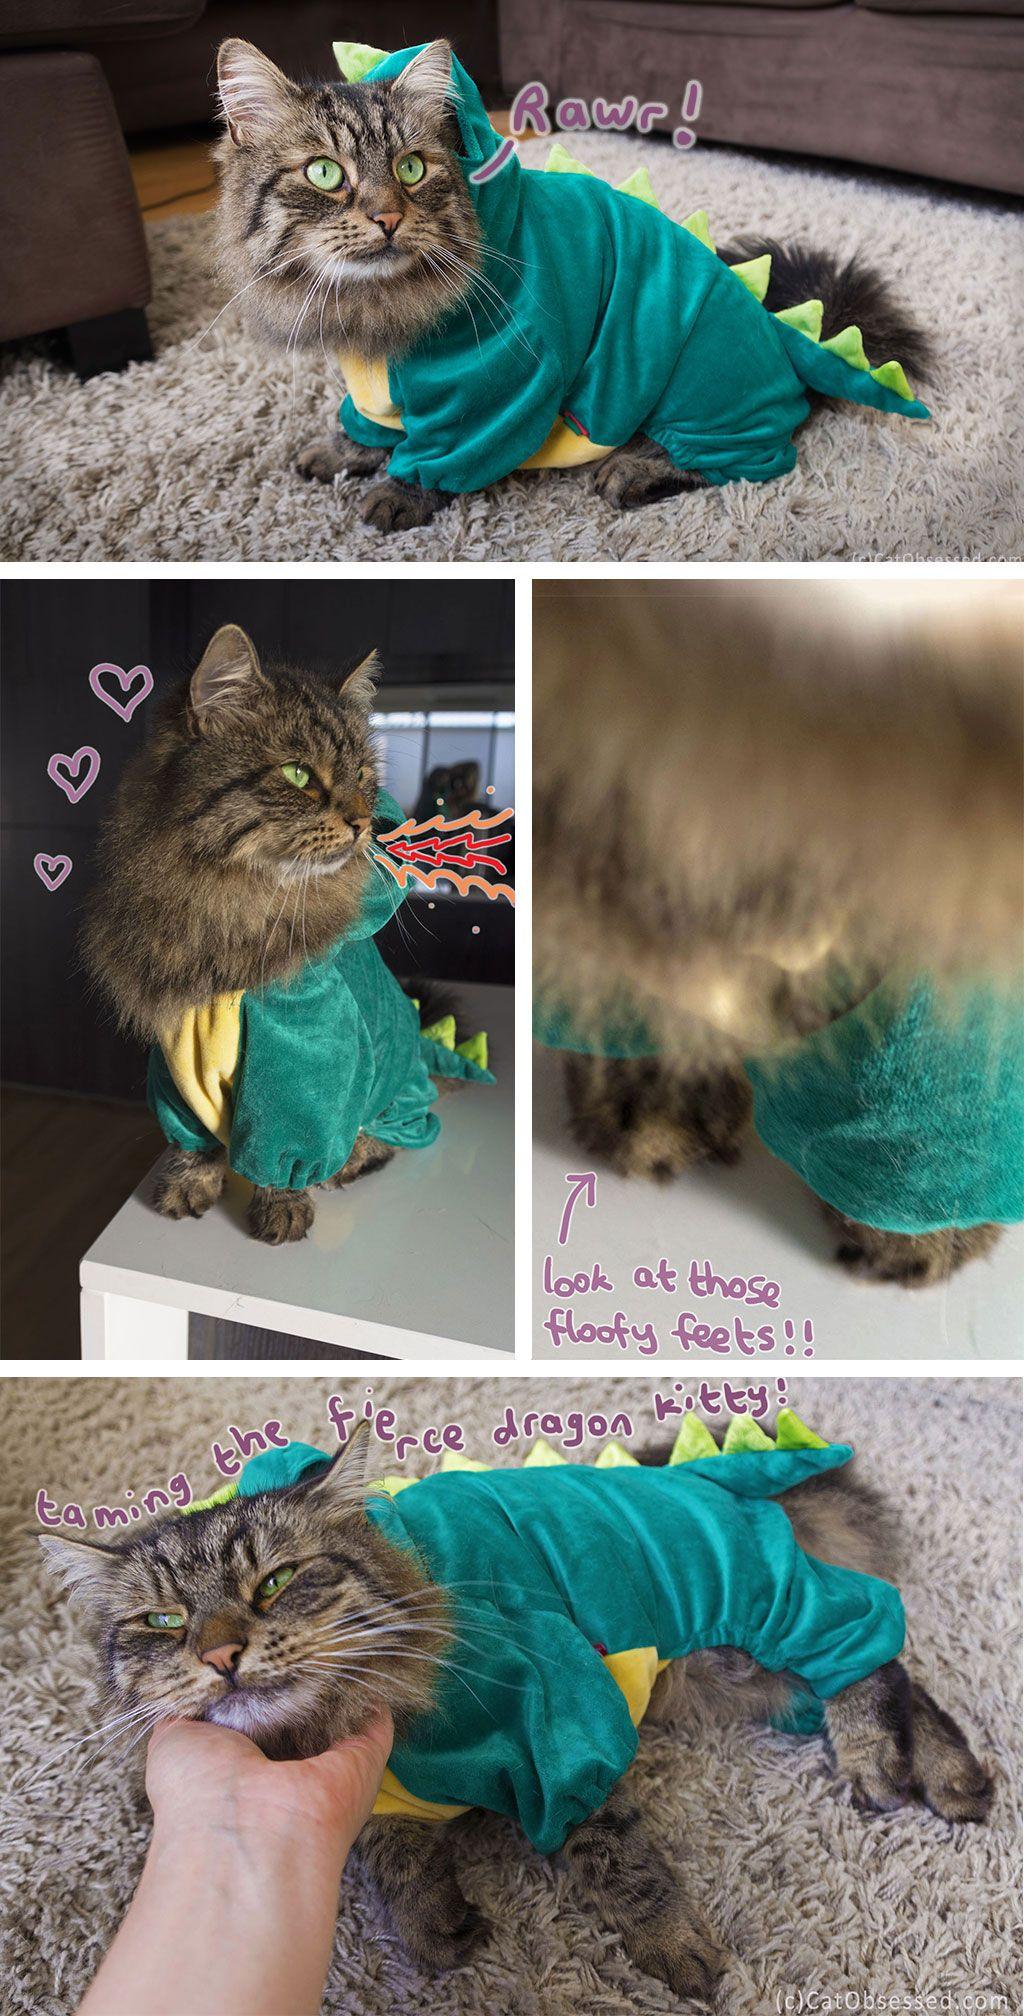 My kitty in a dragon/dinosaur costume!